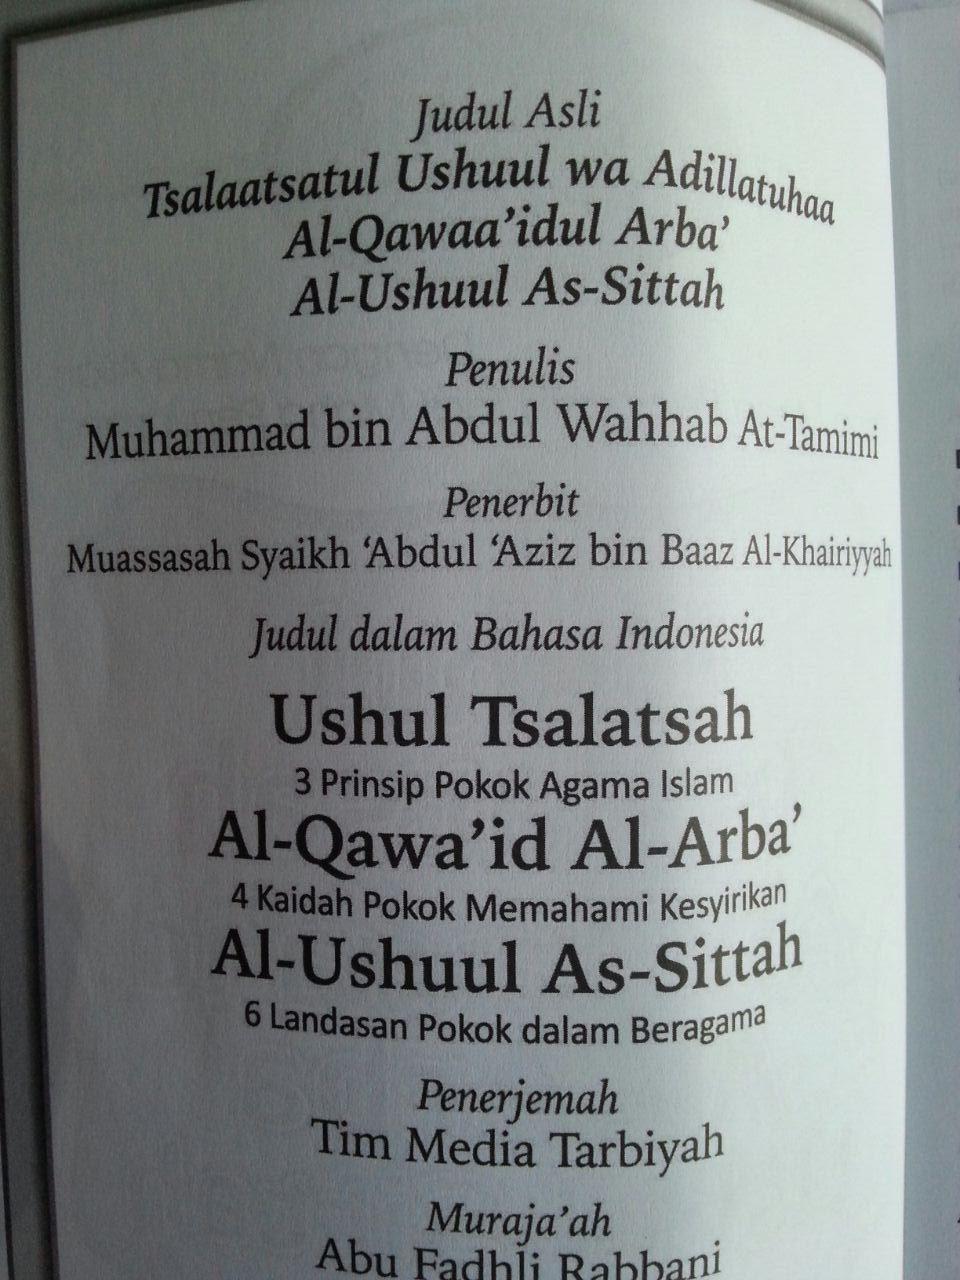 Buku Ushul Tsalatsah Al-Qawa'id Al-Arba' Ushul Sittah isi